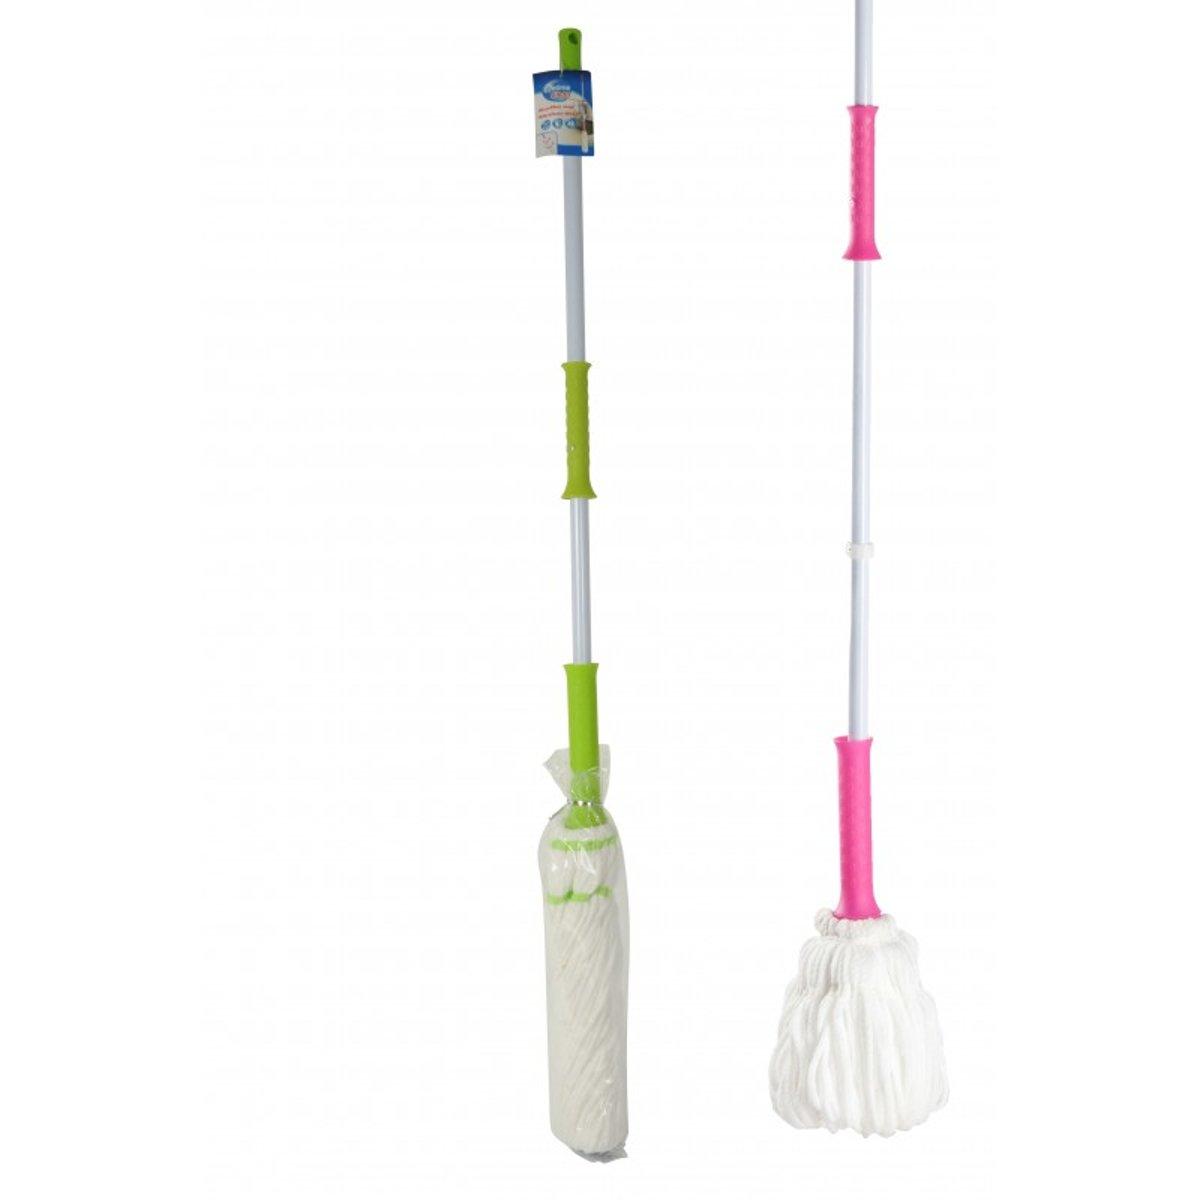 Microfiber mop 133 cm 130 gr Ht kopen